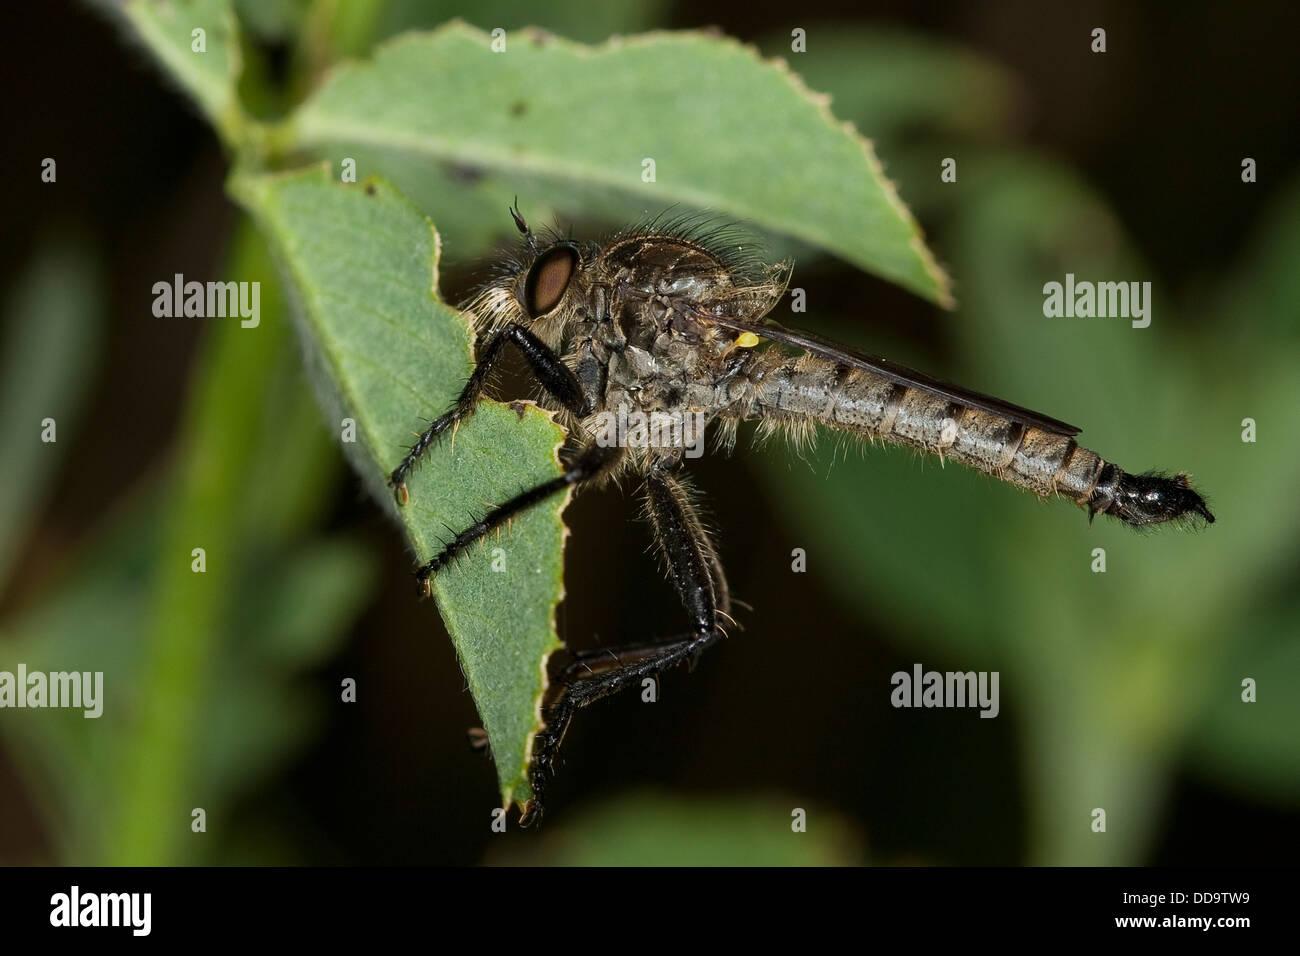 Robberfly, robber-fly, Robberflies, Berg-Raubfliege, Bergraubfliege, Raubfliege, Raubfliegen, Strauchdieb, Didysmachus - Stock Image